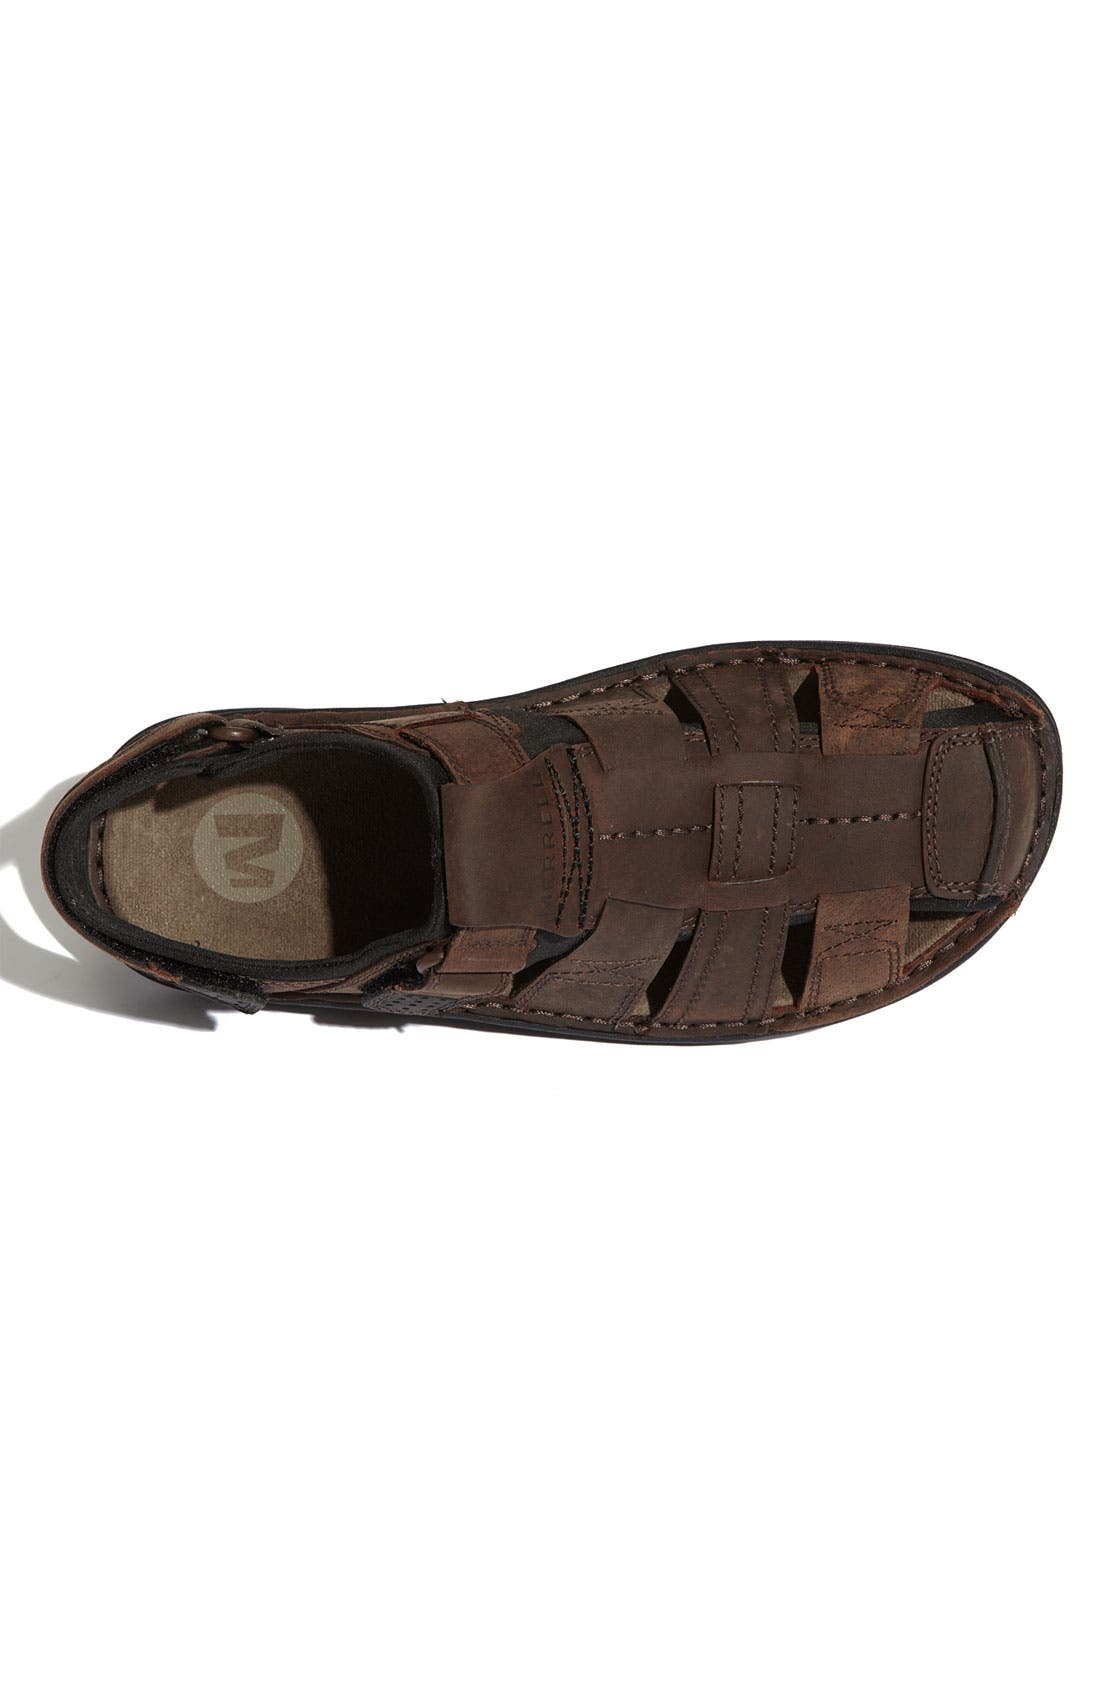 Alternate Image 3  - Merrell 'World Midway' Sandal (Online Only)